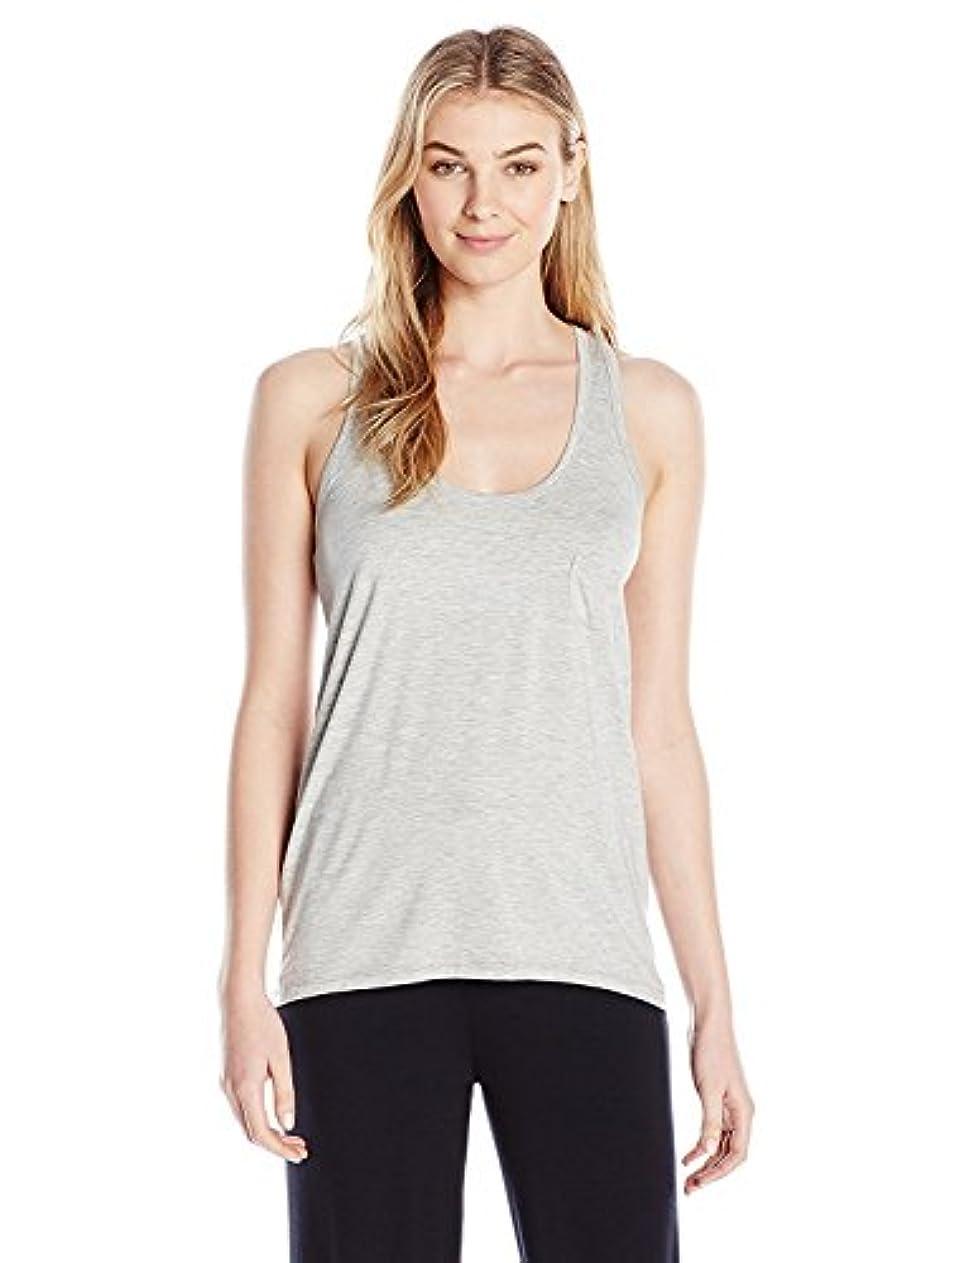 広く良心鼻Daniel Buchler Women's Rayon Blend Tank Top Grey Heather X-Large [並行輸入品]